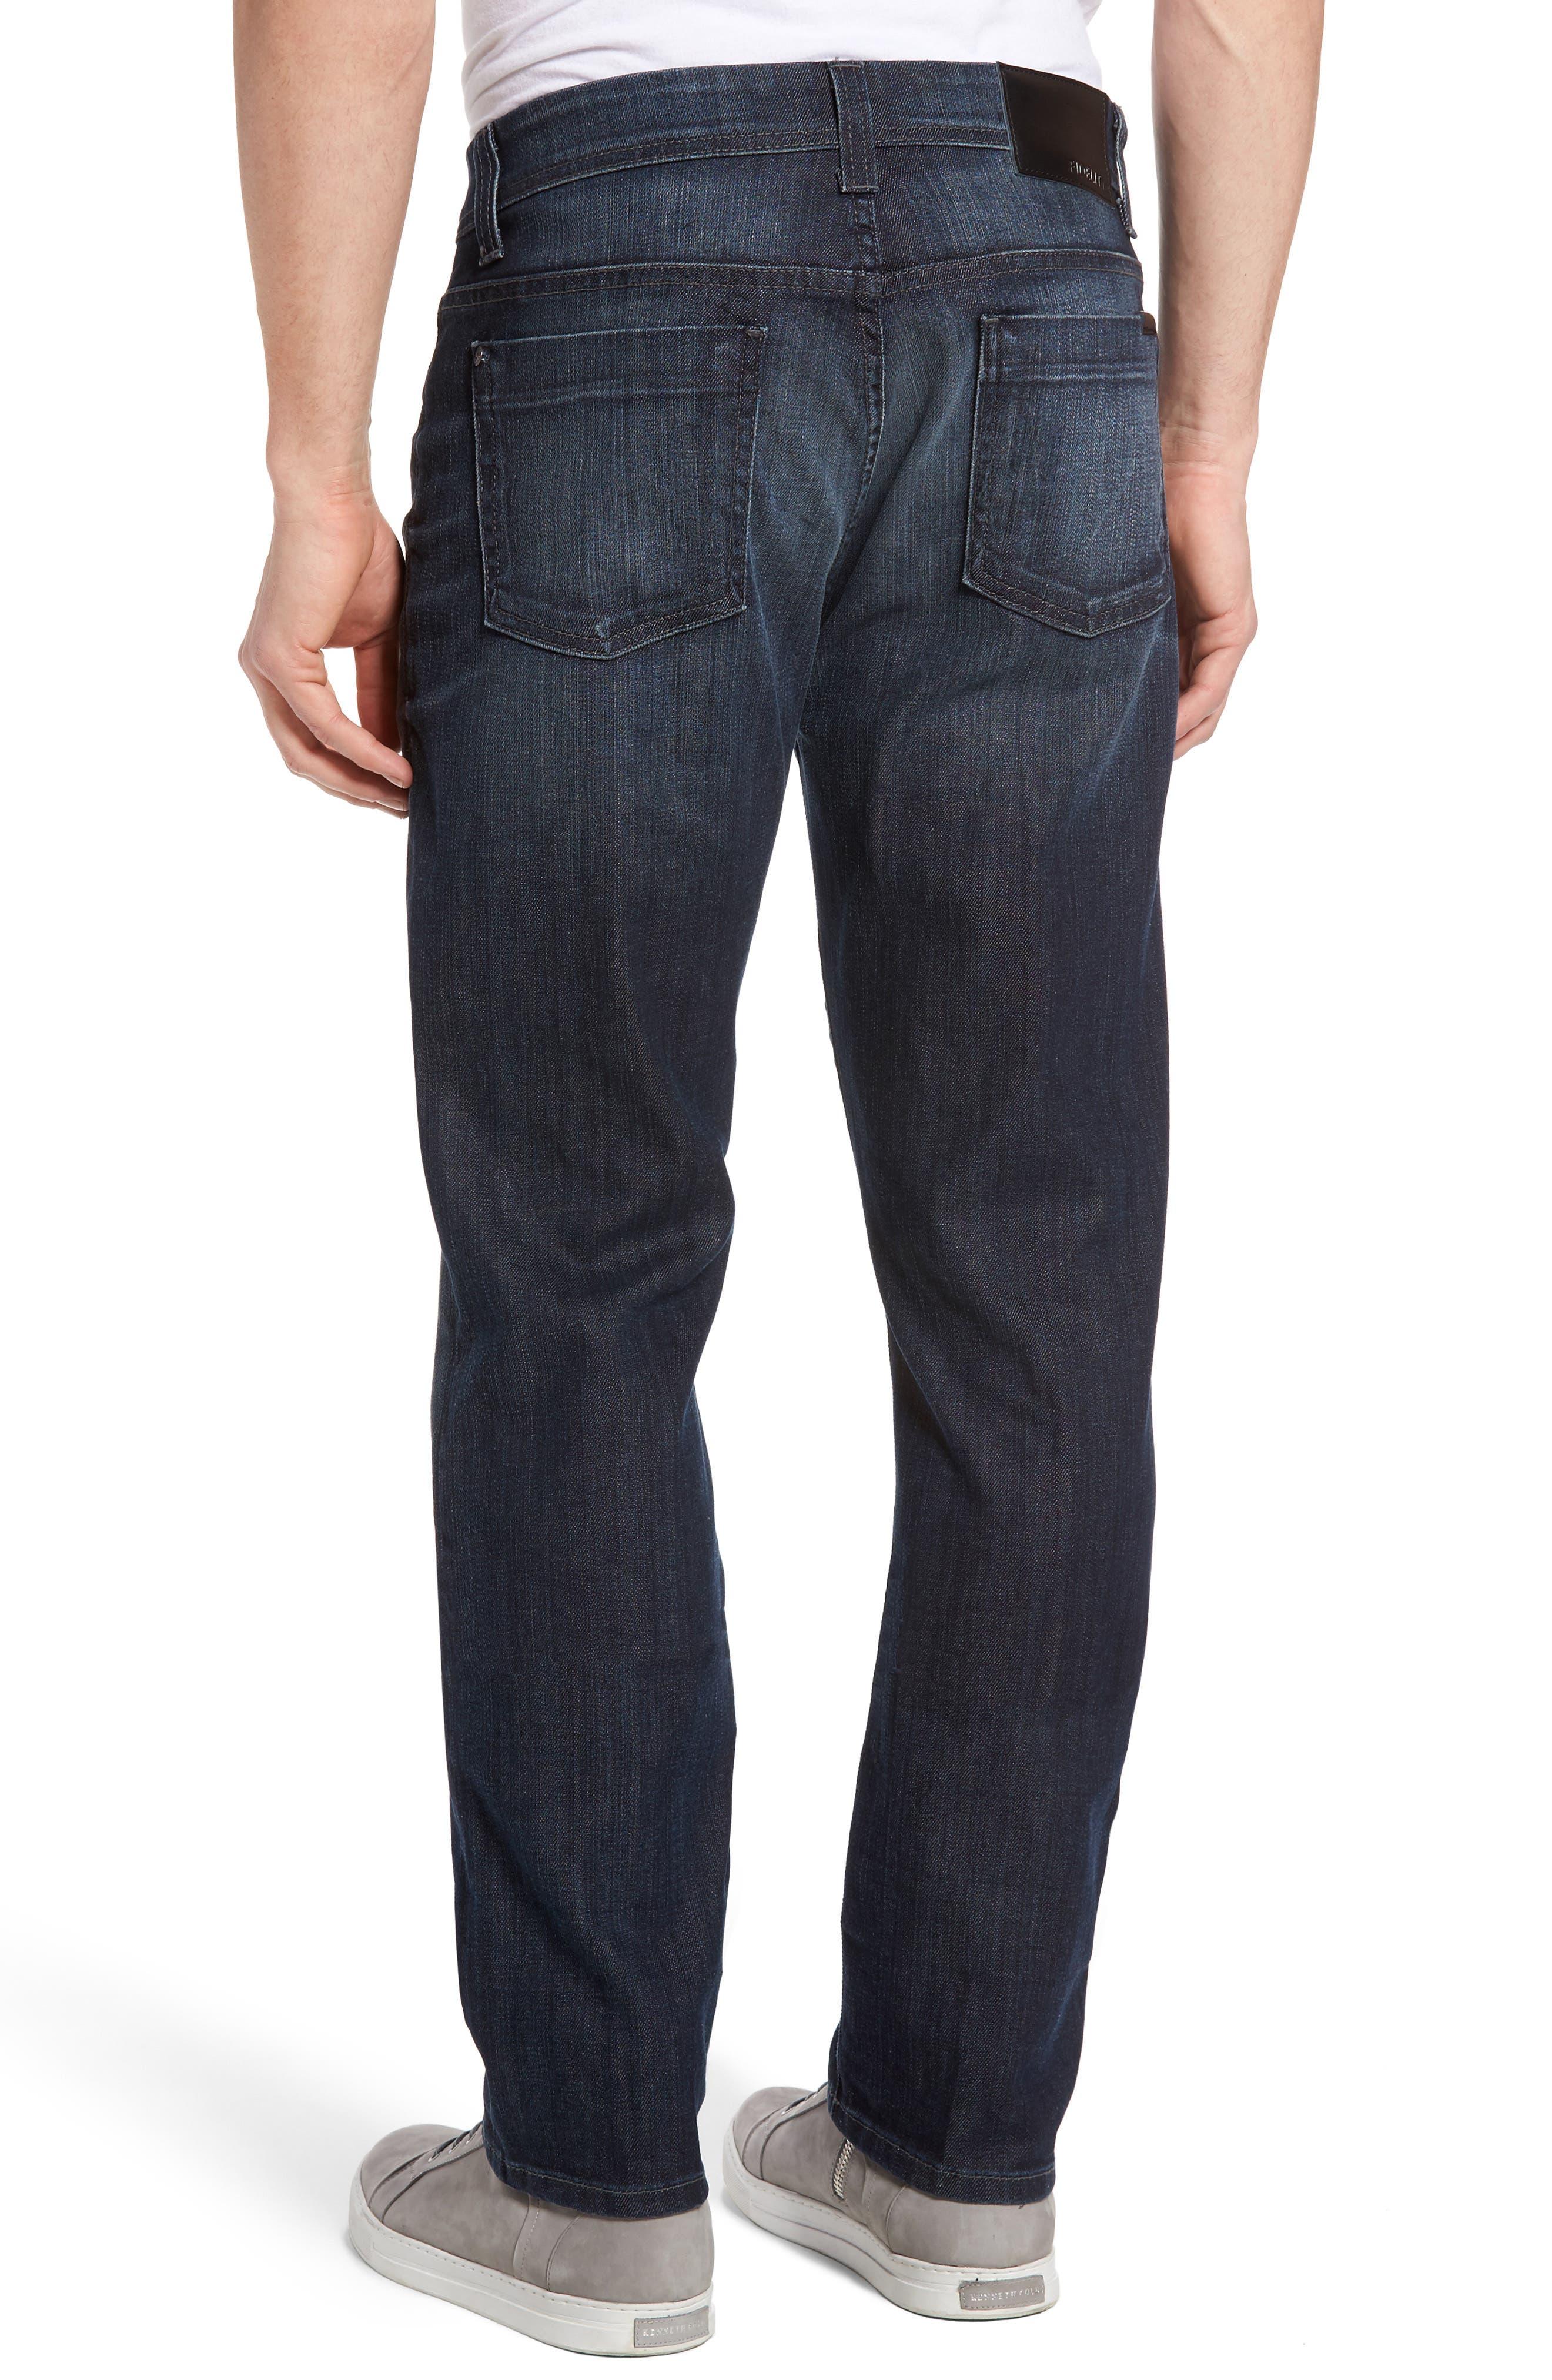 Jimmy Slim Straight Leg Jeans,                             Alternate thumbnail 2, color,                             Scorpion